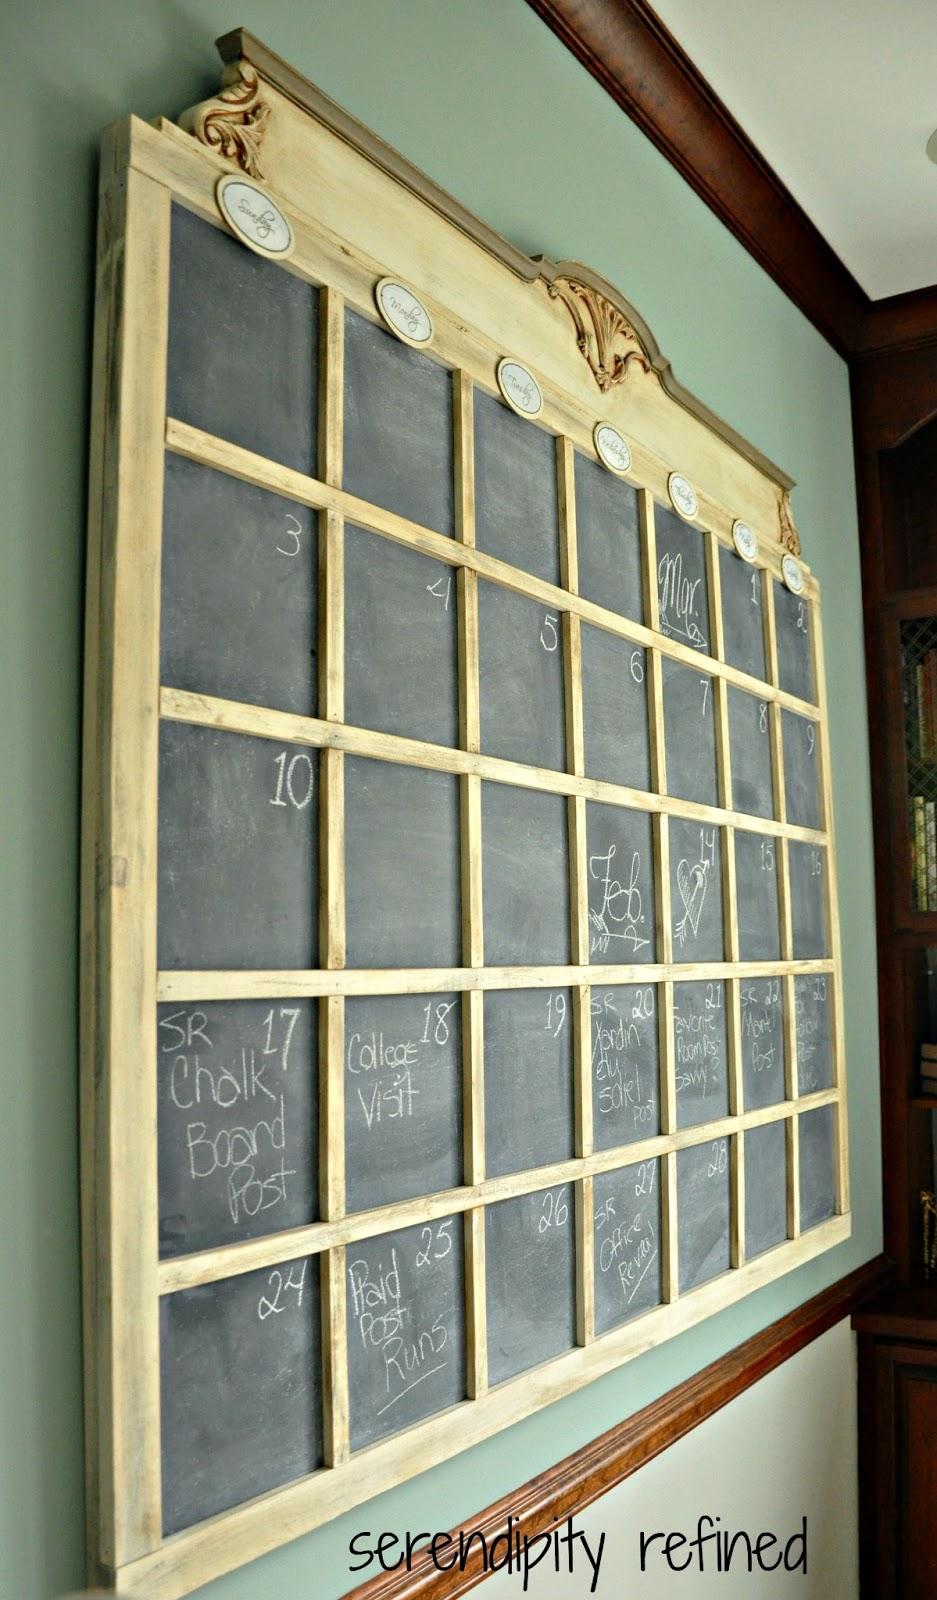 Serendipity Refined Blog: DIY Chalkboard Wall Calender